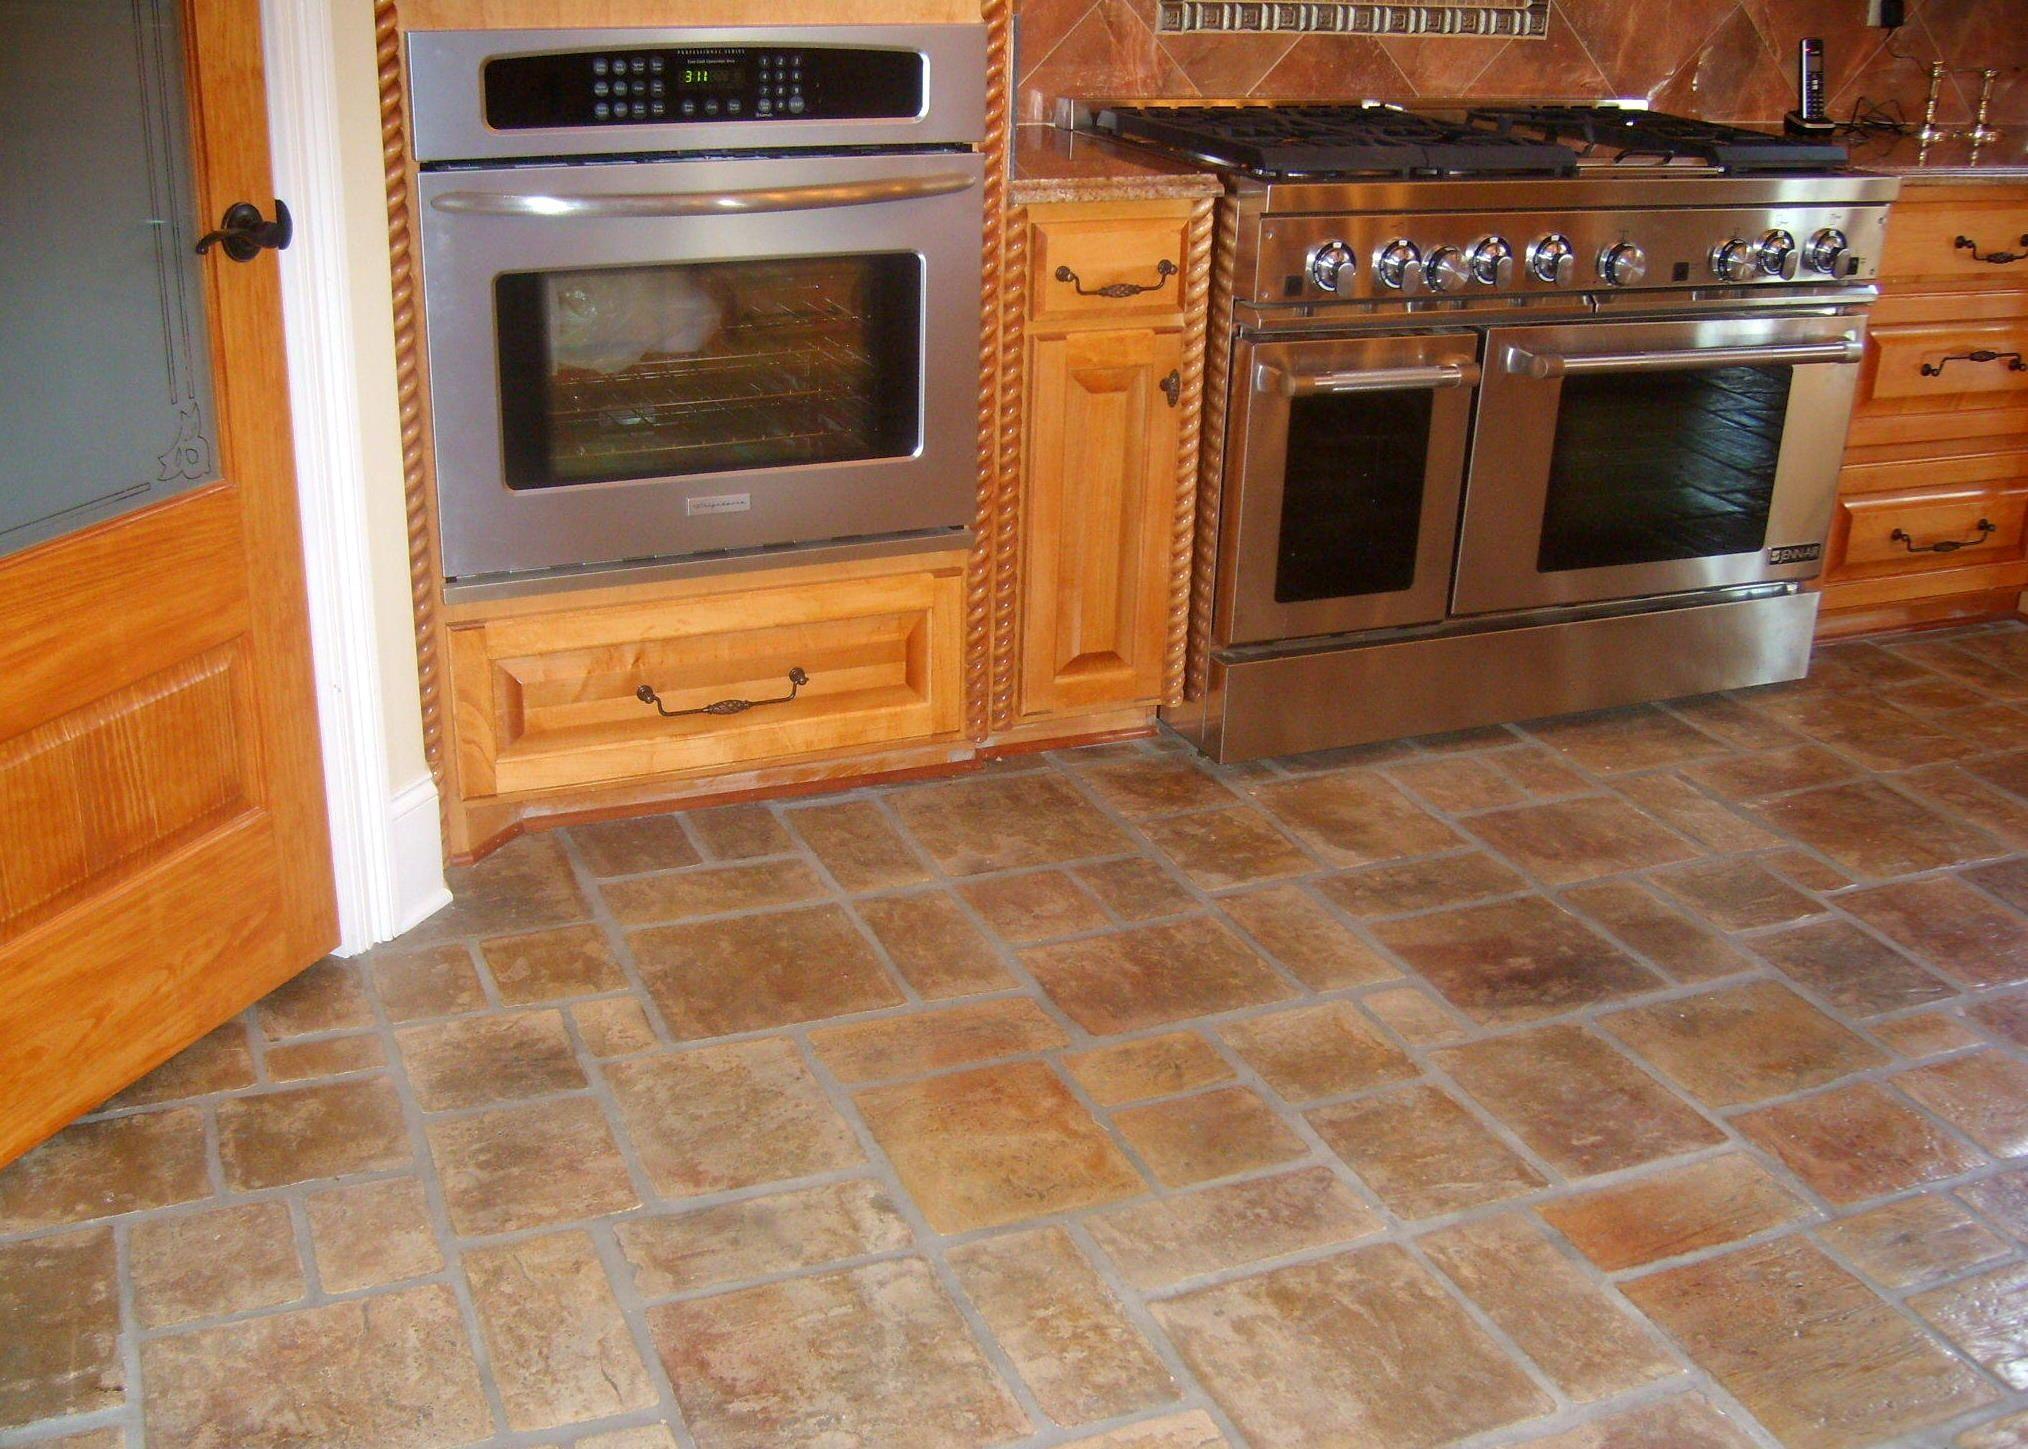 8 inspirational photos of gorgeous brick flooring kitchen floors 8 inspirational photos of gorgeous brick flooring brick kitchen floorskitchen tile dailygadgetfo Choice Image